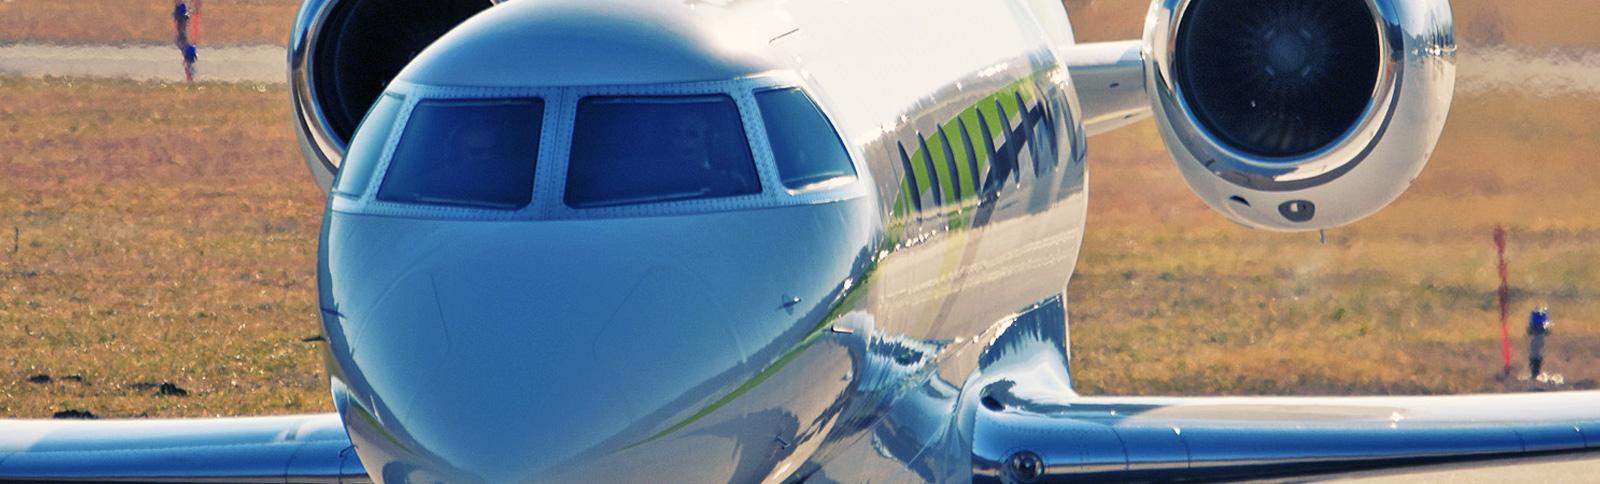 Lugano Airport Qualification - Airport Briefing